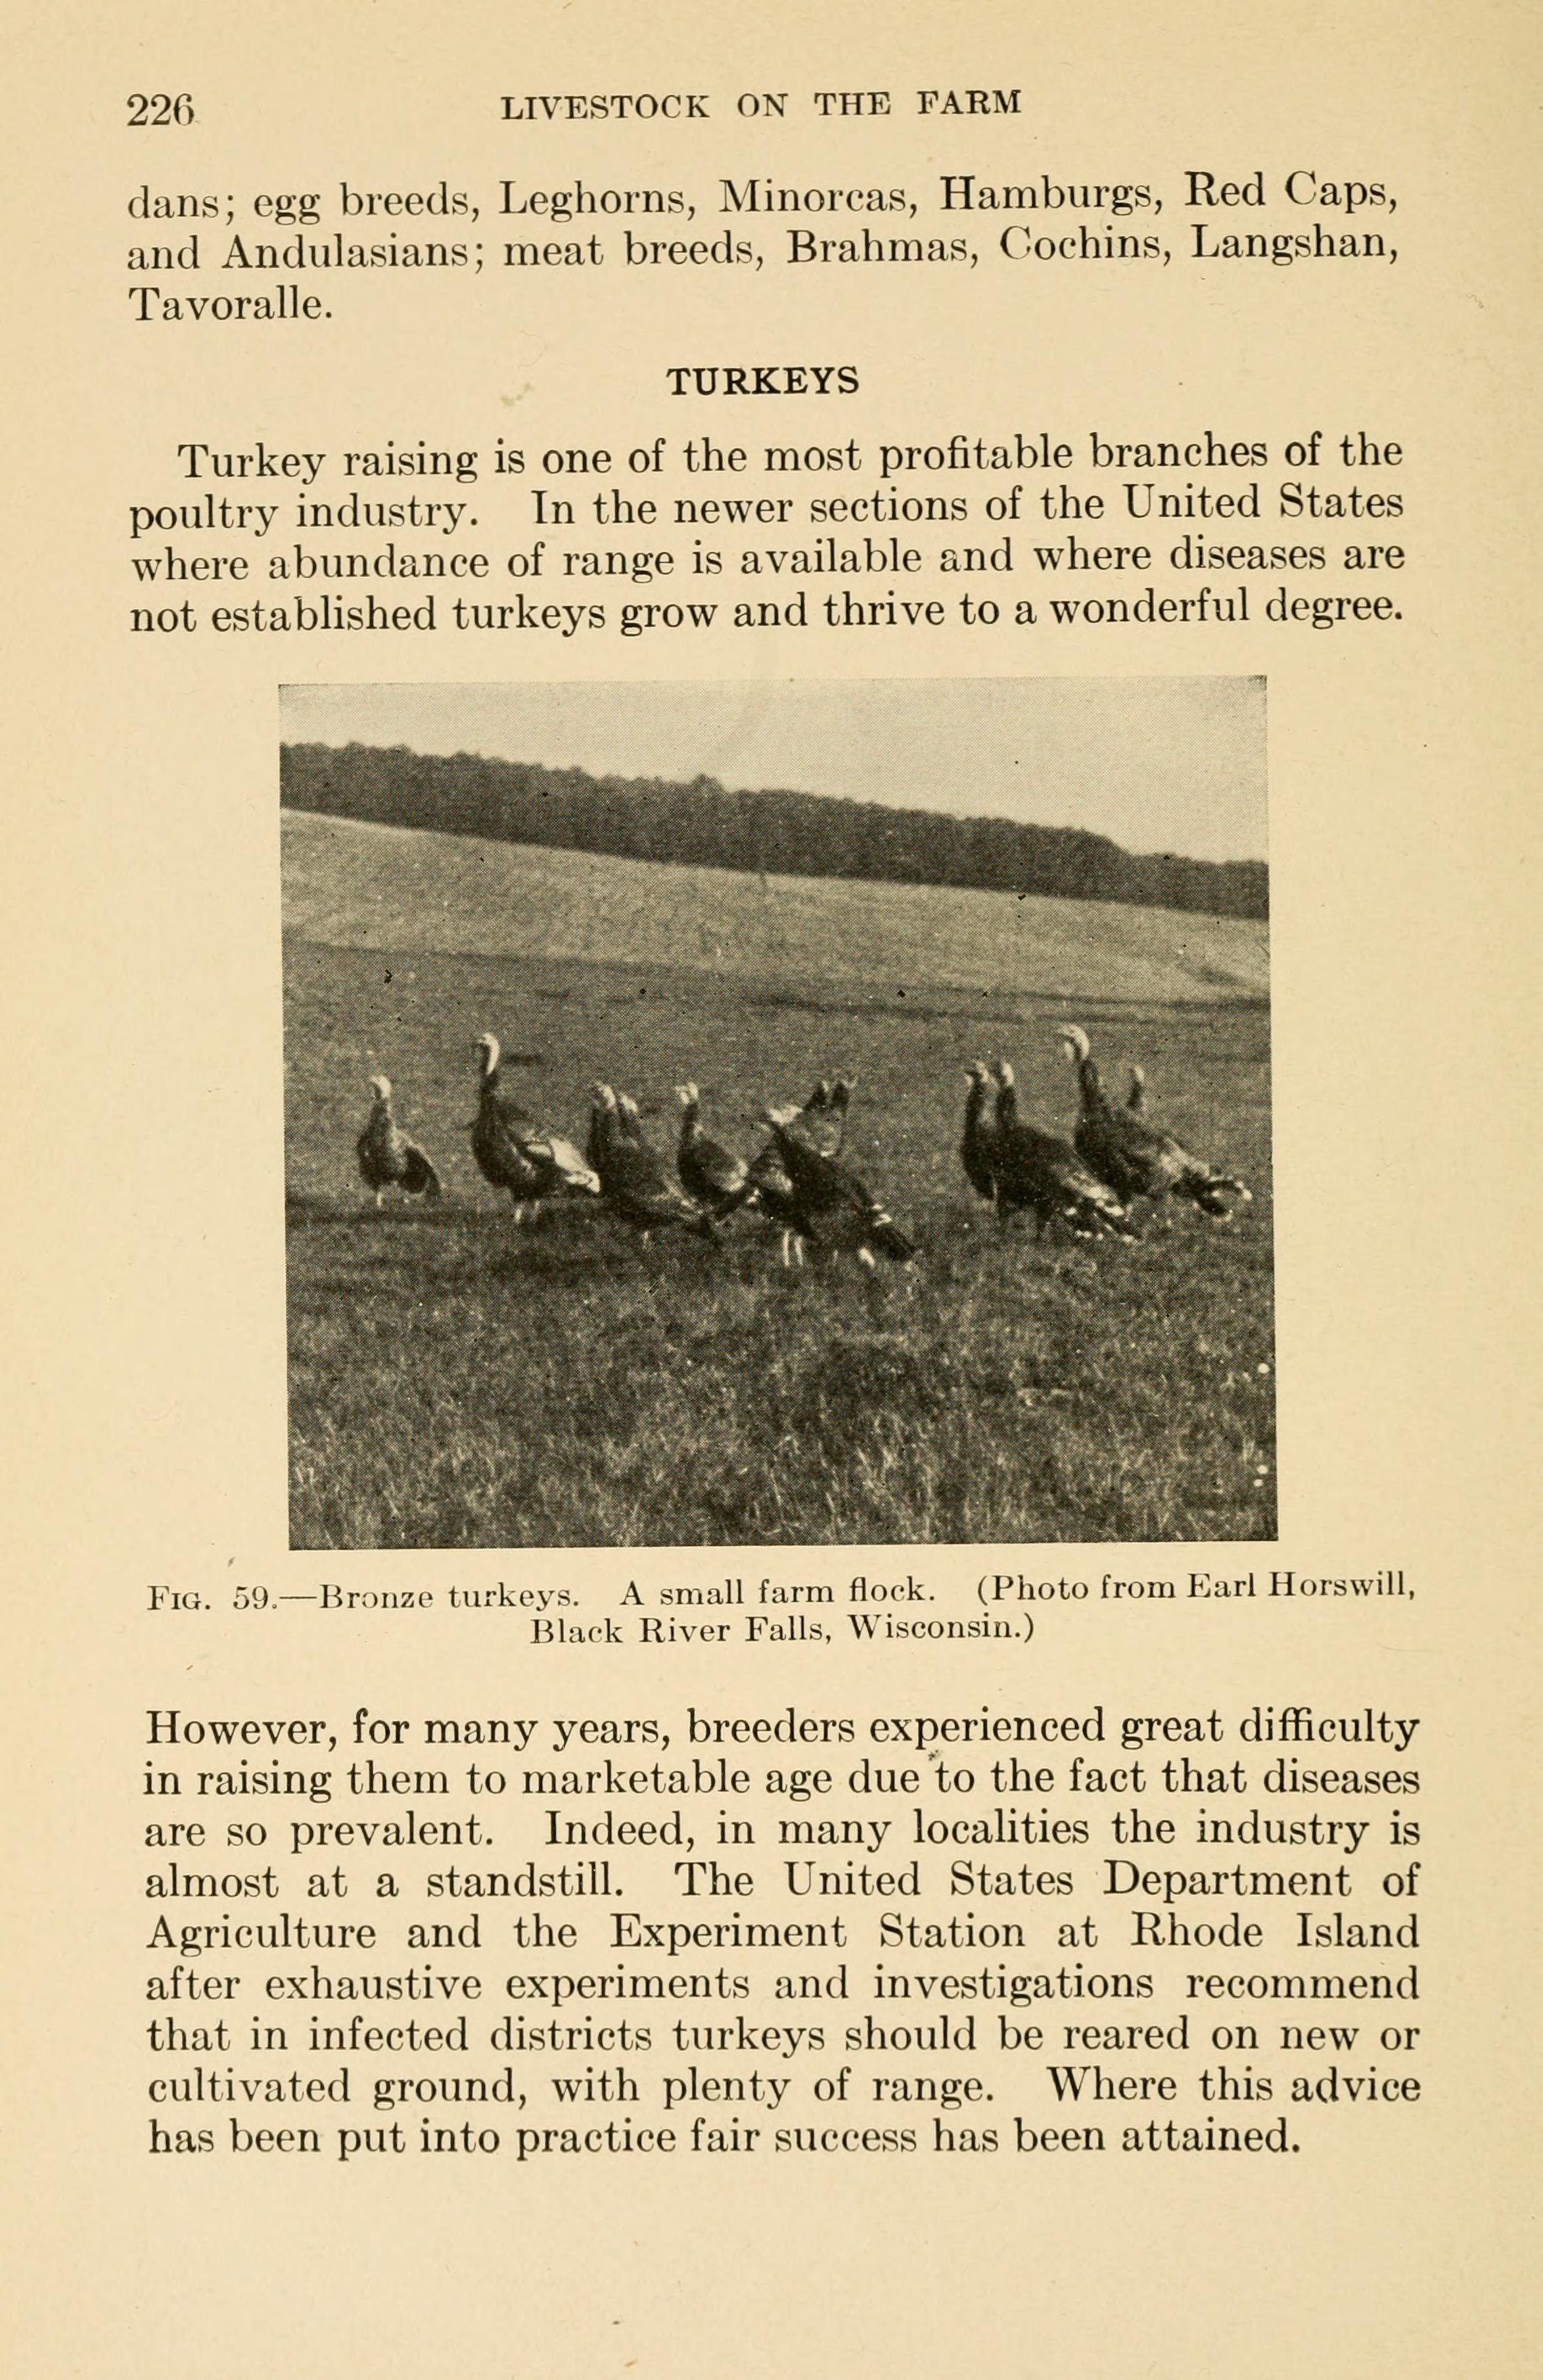 File:Livestock on the farm (Page 226) BHL18507719 jpg - Wikimedia